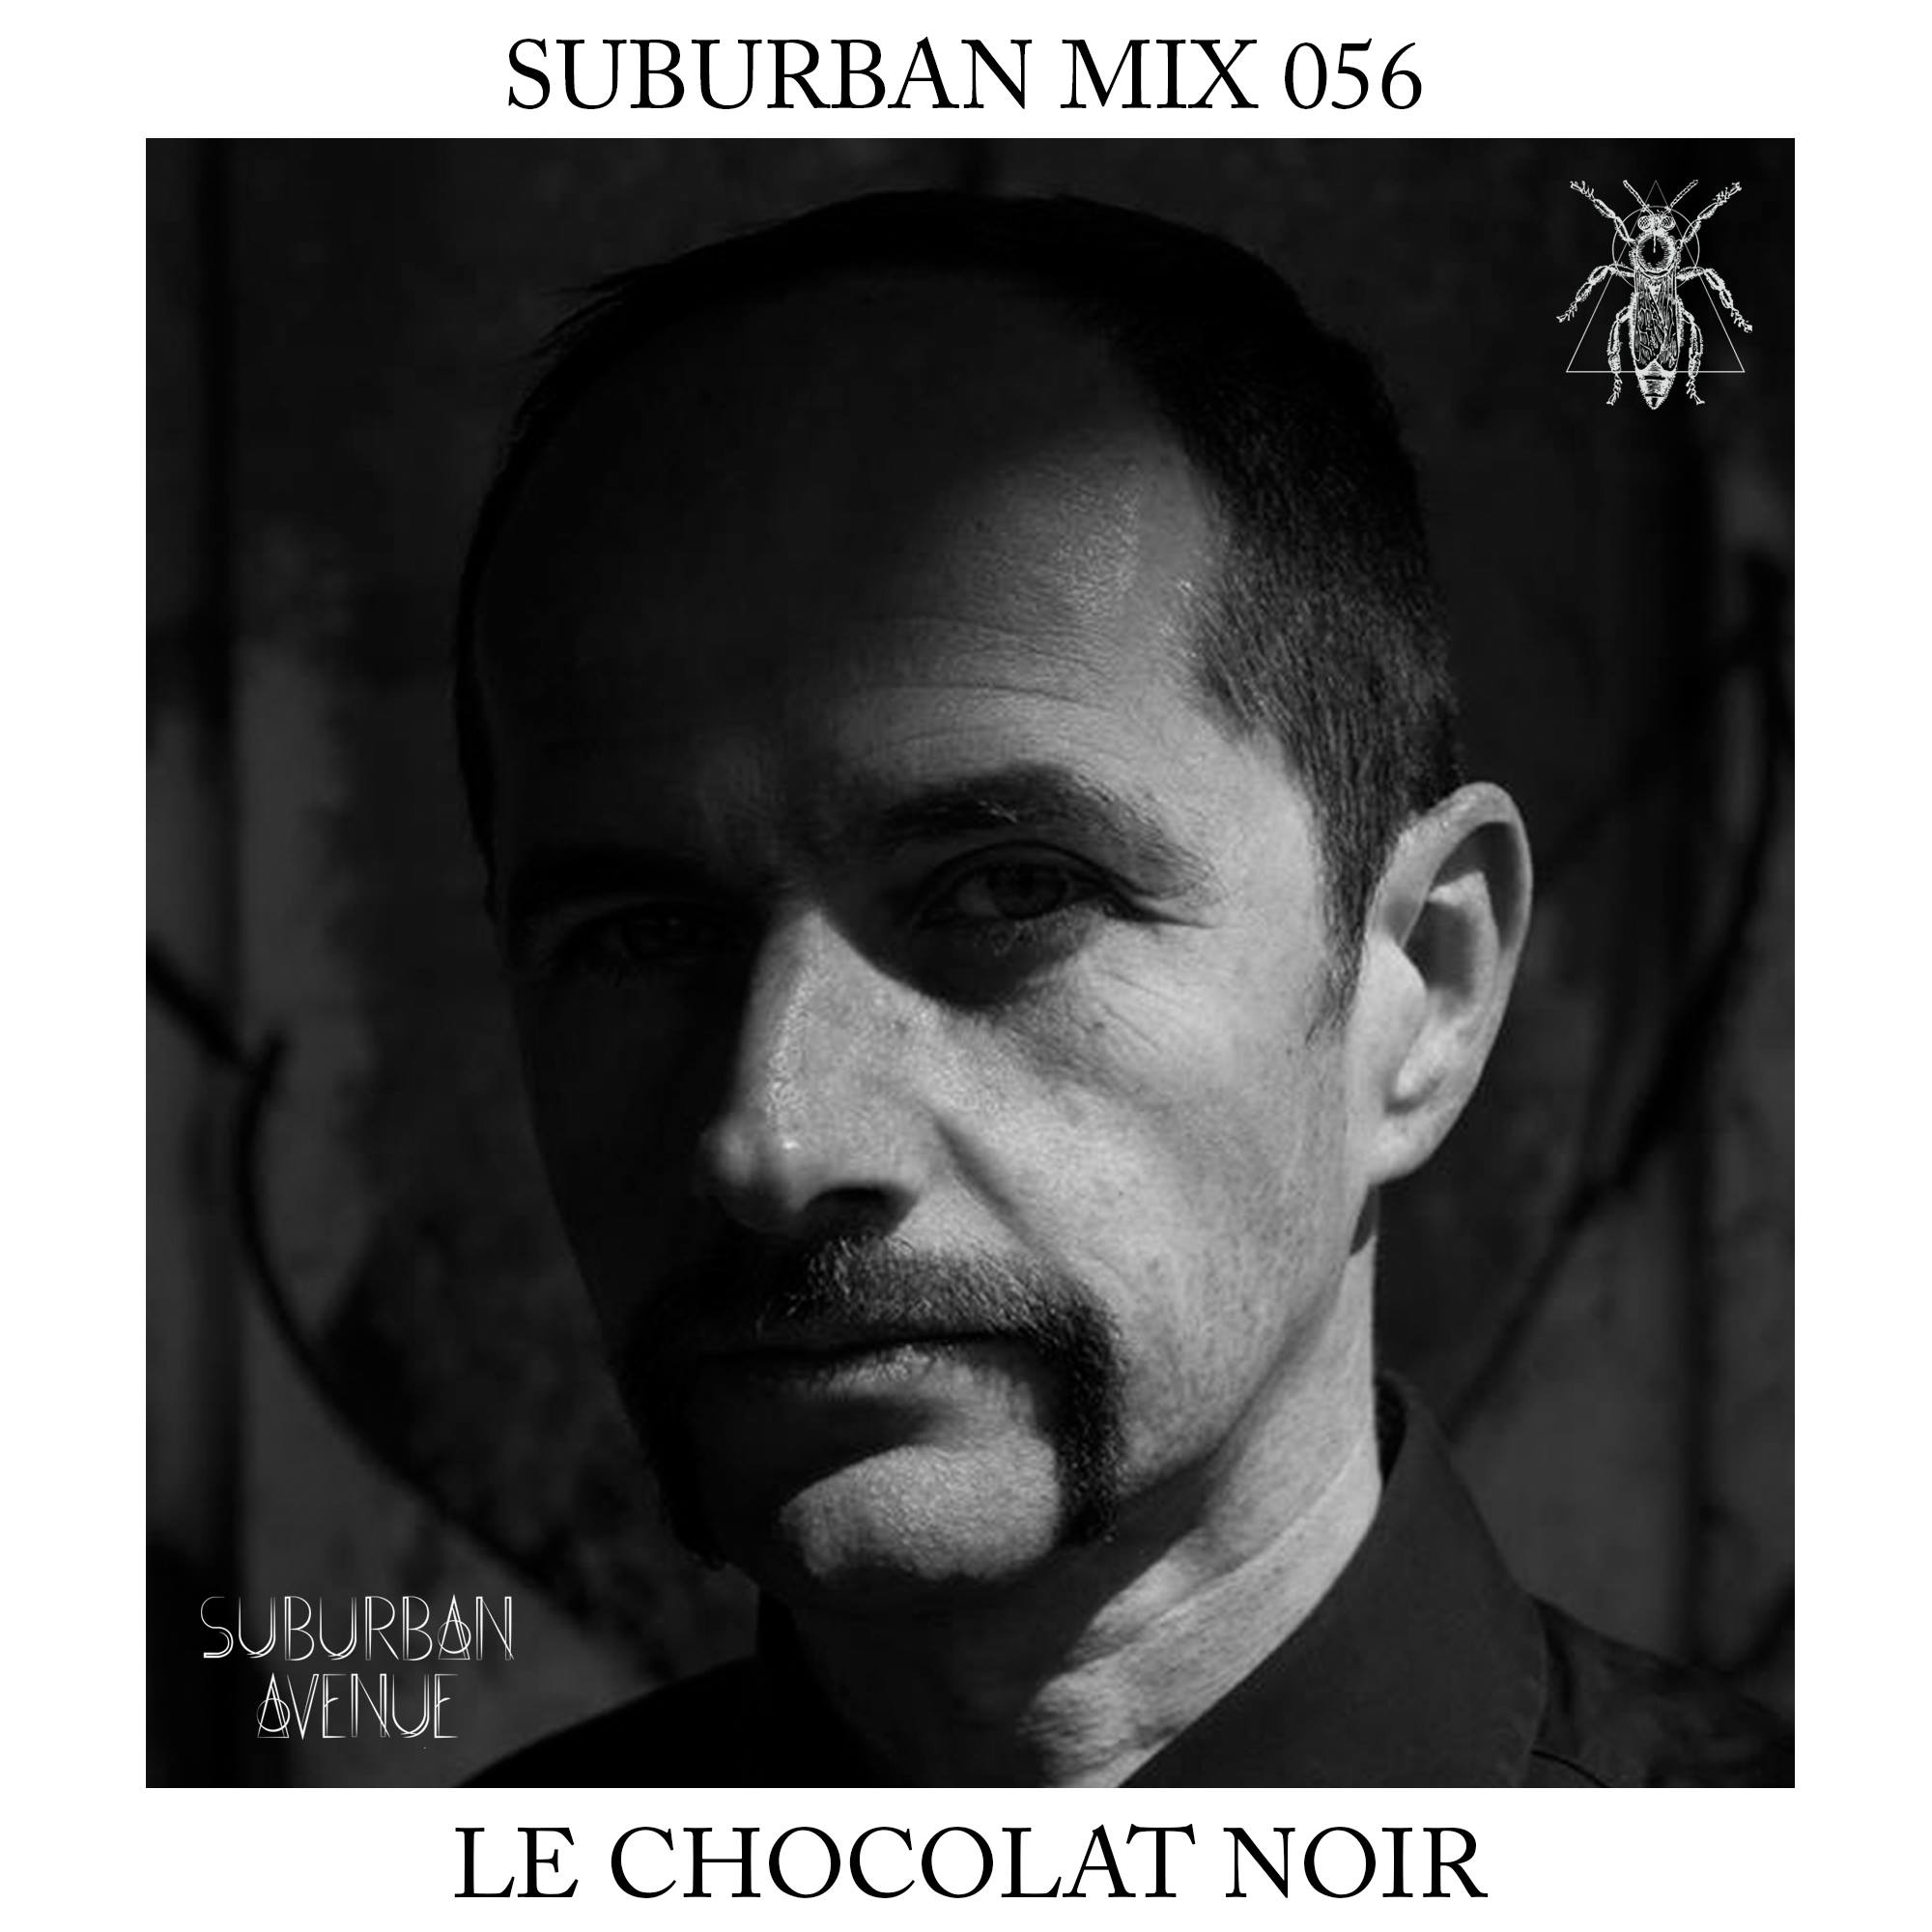 Suburban Mix 056 - Le Chocolat Noir